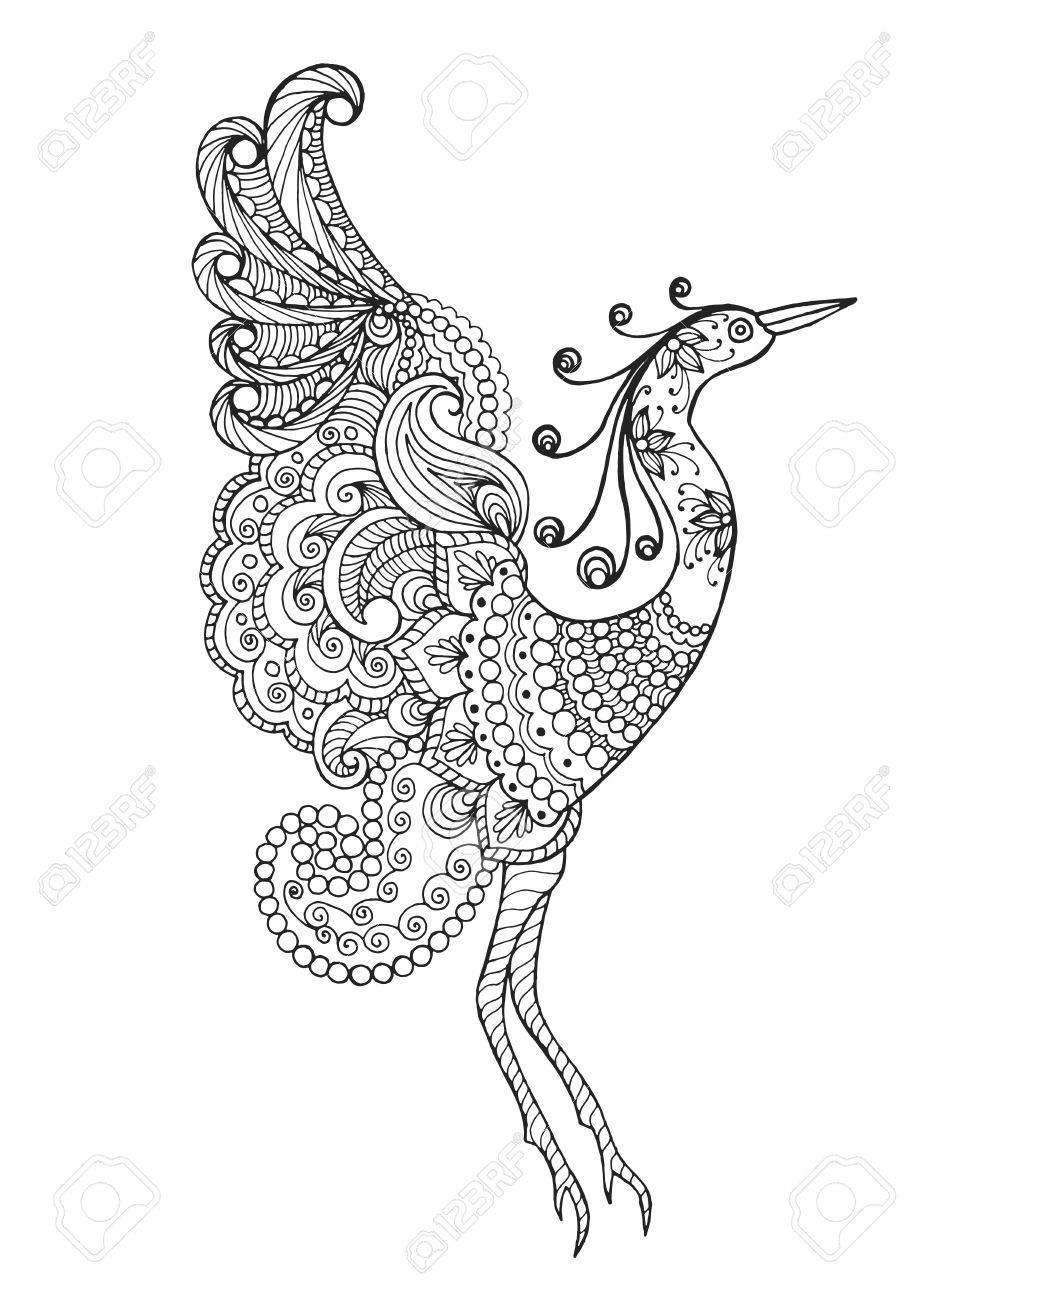 1040x1300 Fantasy Bird. Black White Hand Drawn Doodle Animal. Ethnic